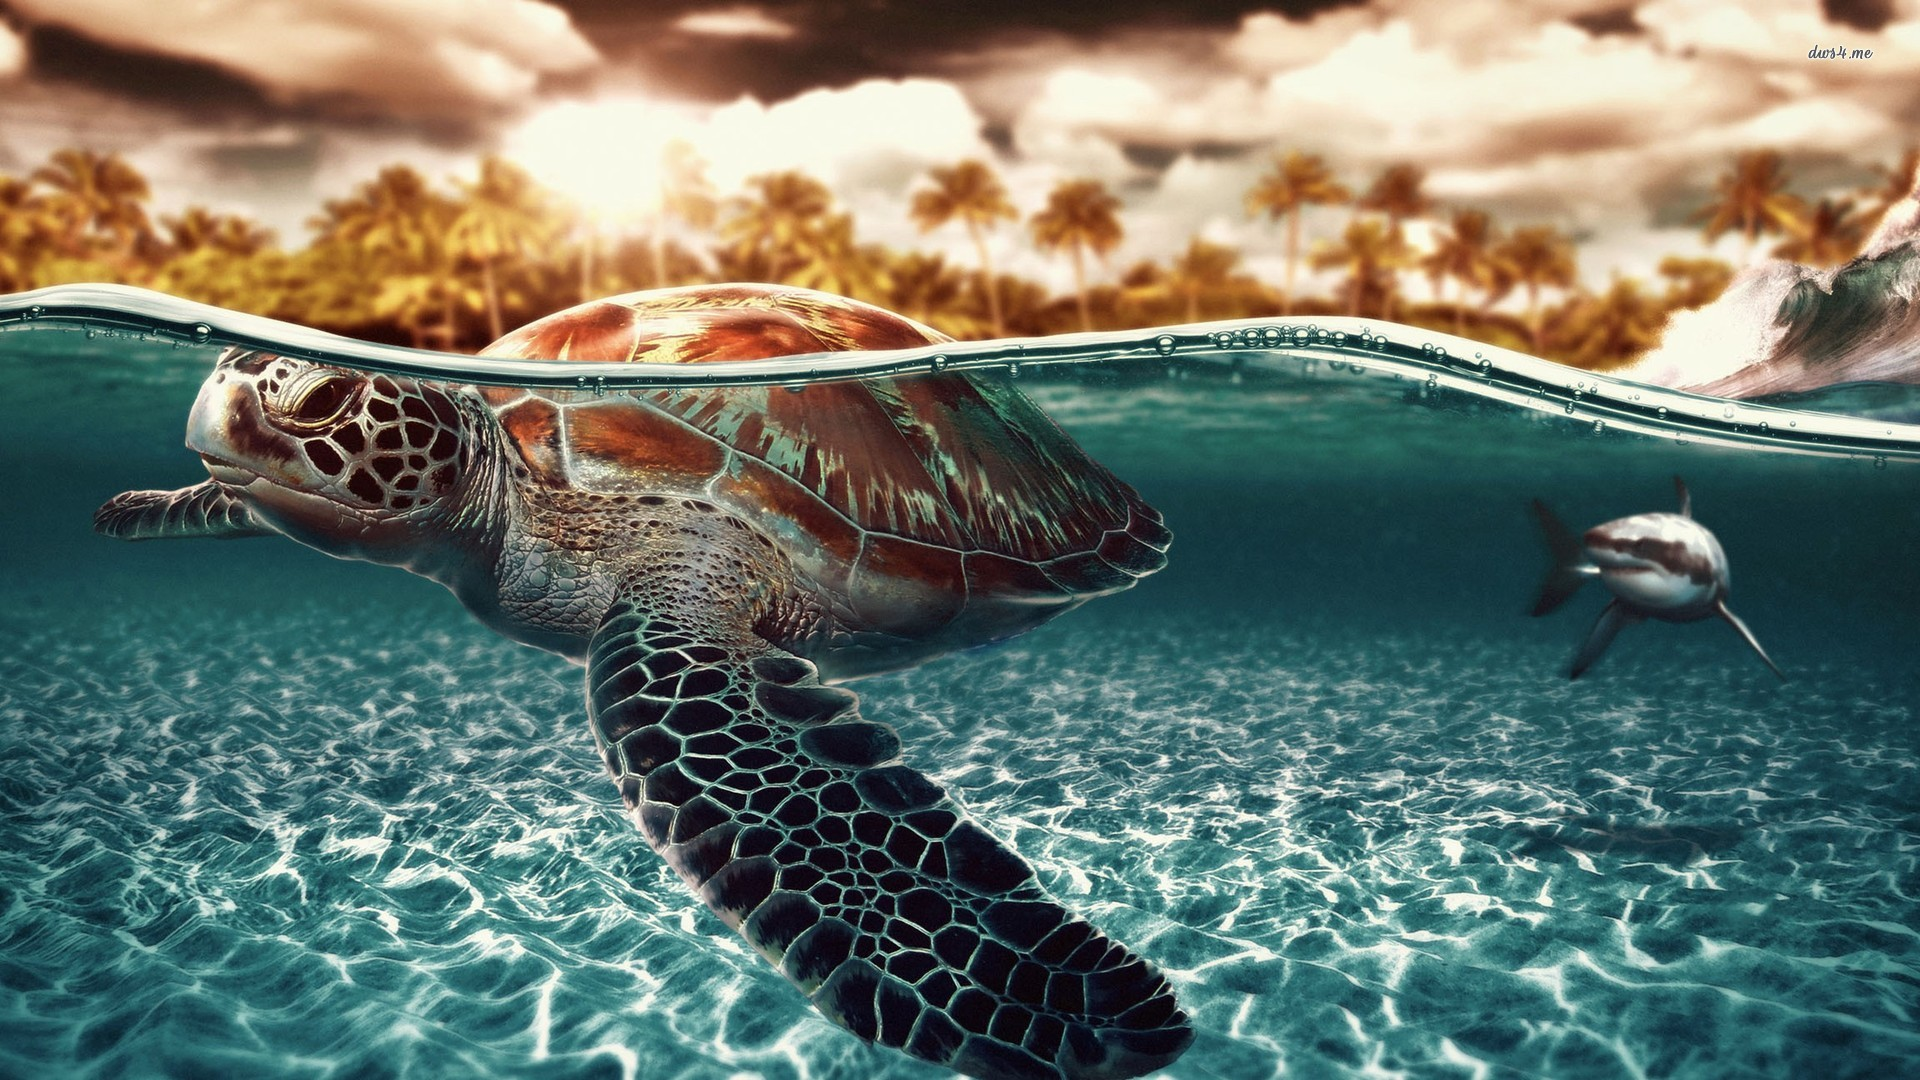 ... Sea turtle and shark wallpaper 1920x1080 ...